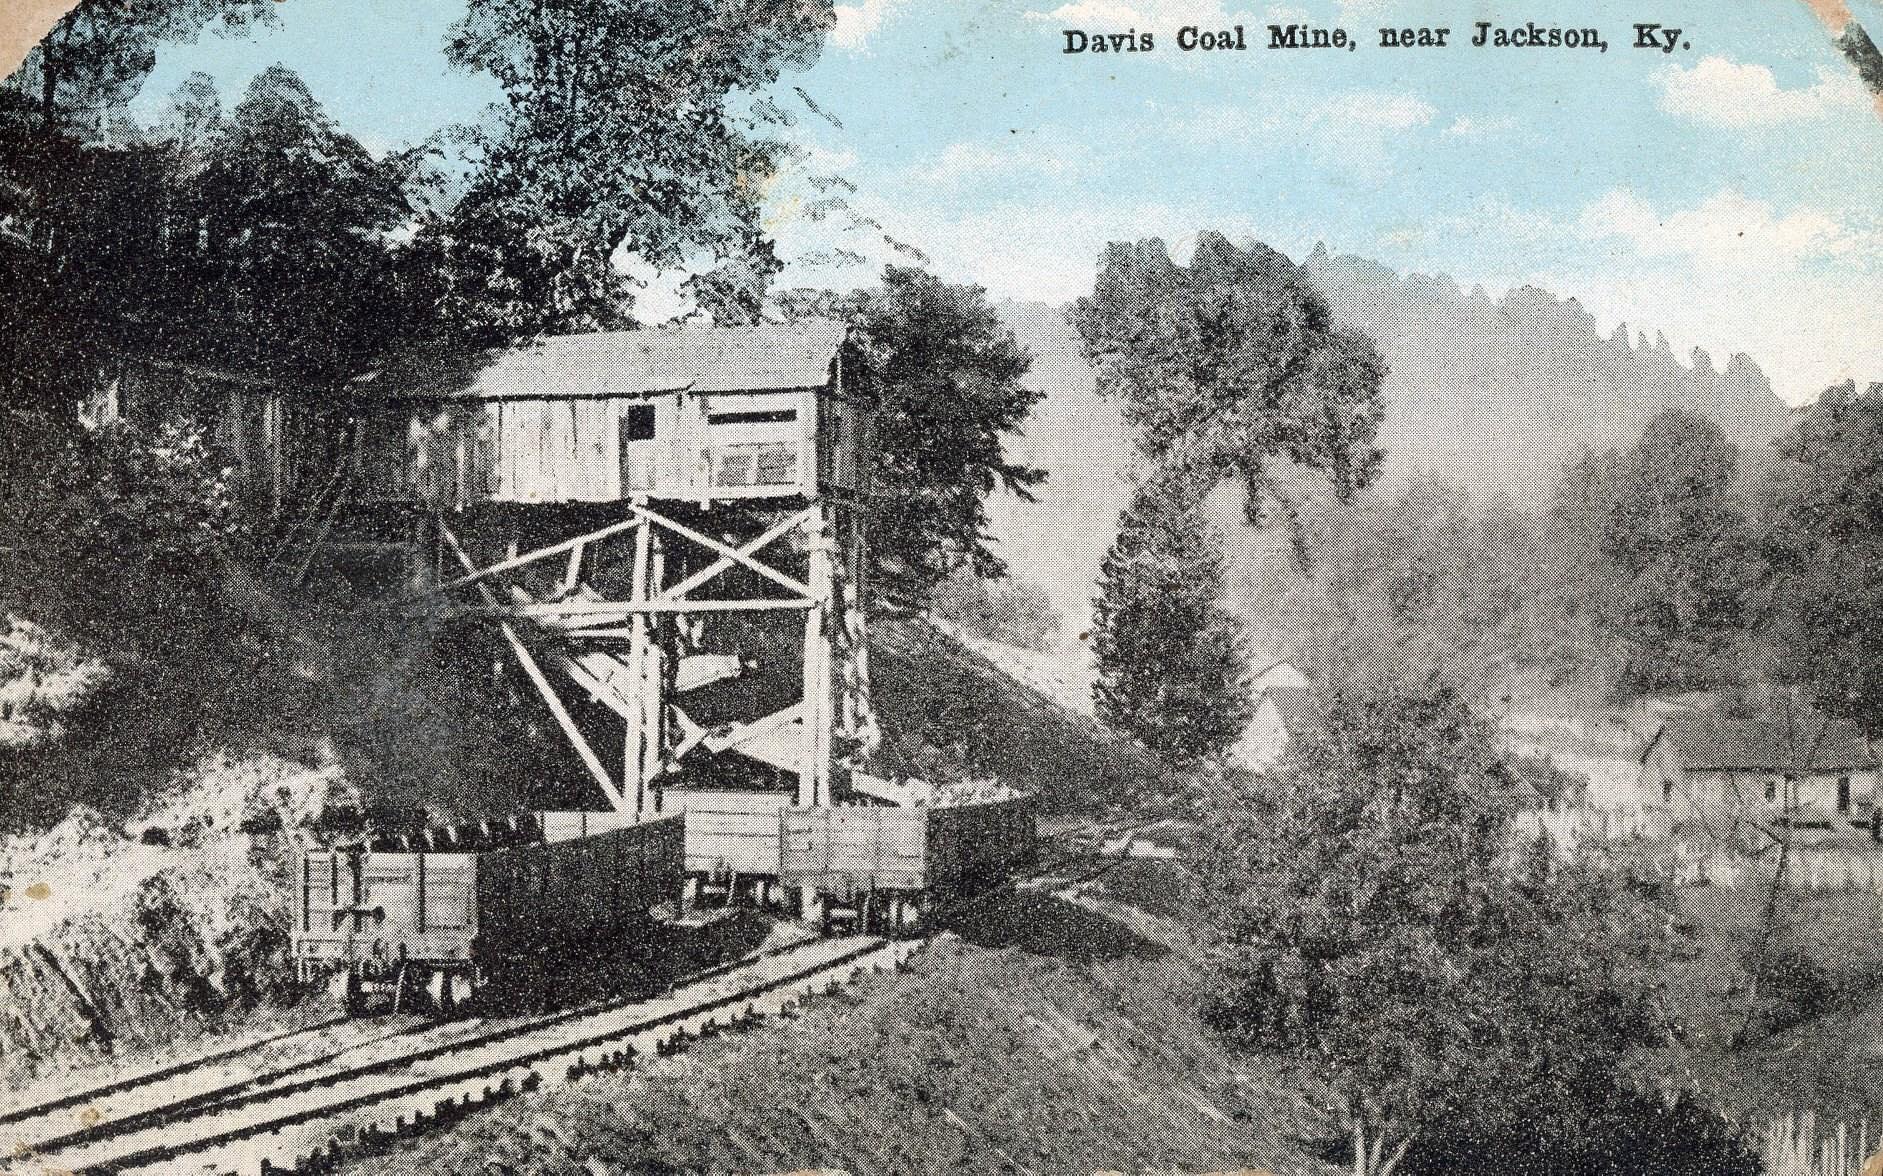 Davis Coal Mine, near Jackson, KY. (source Sandy Keith)